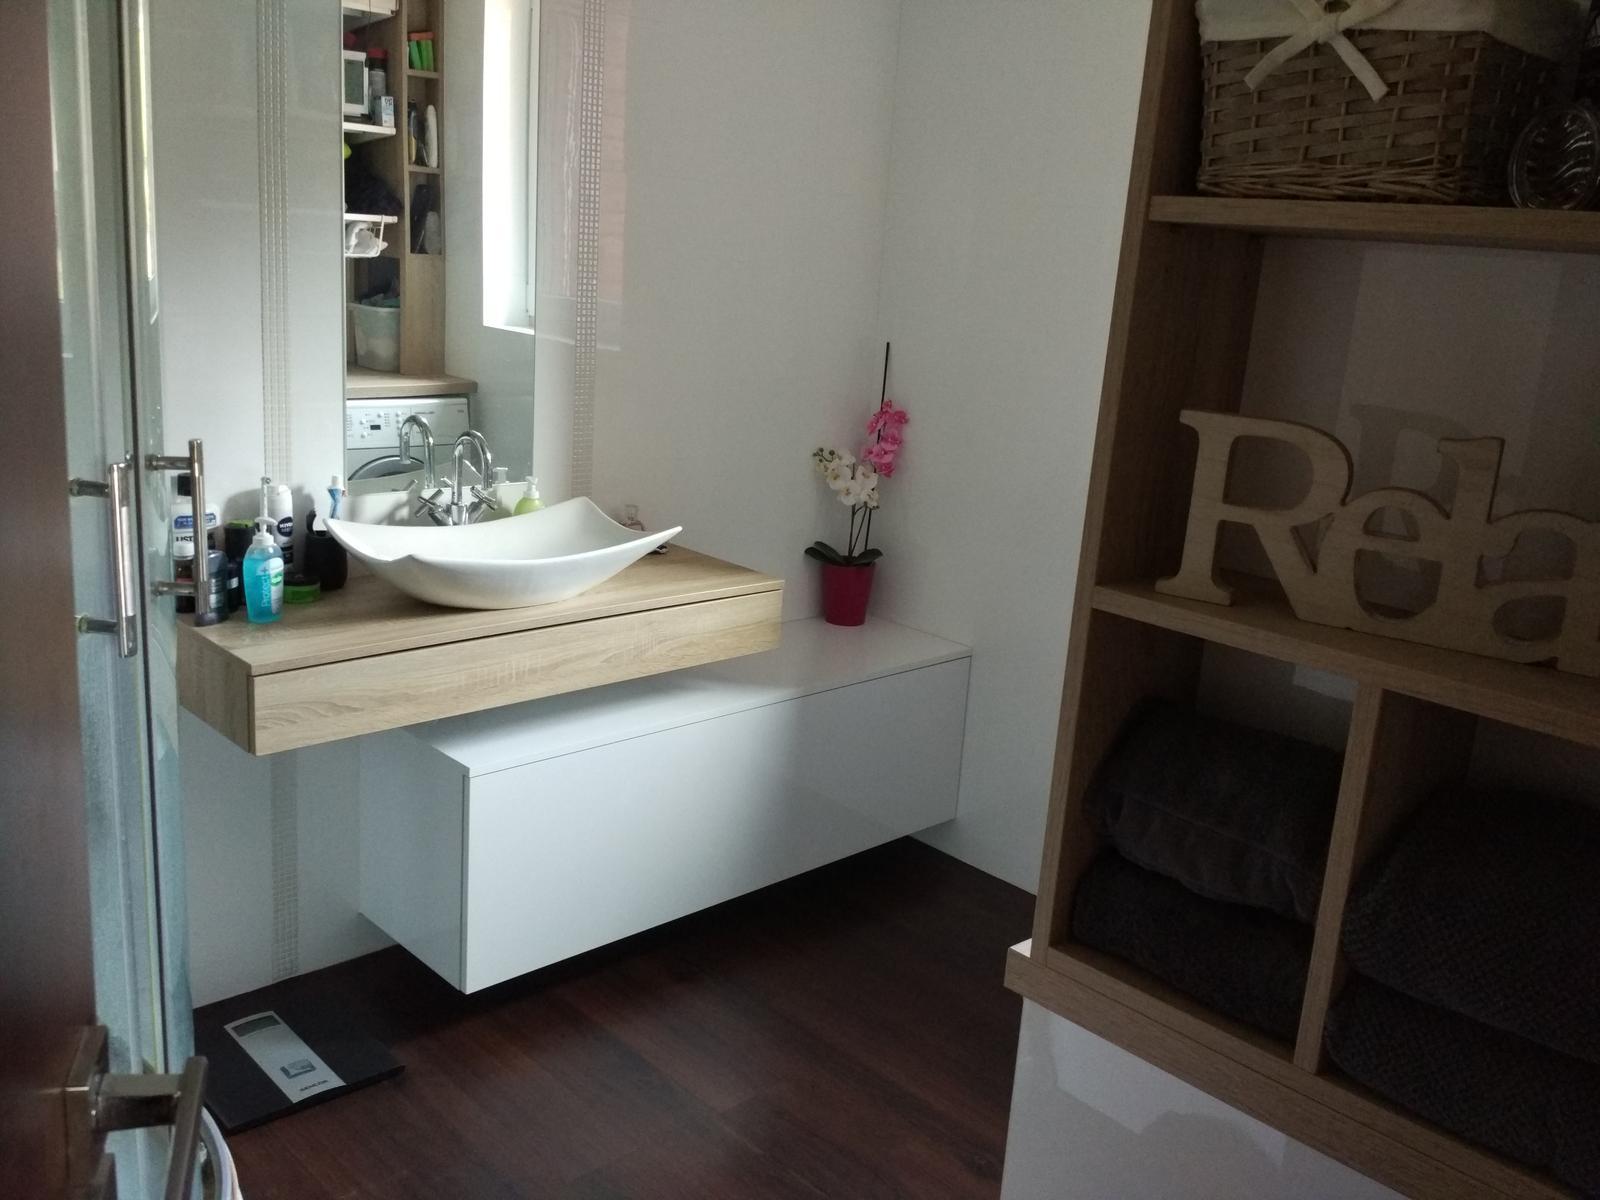 Koupelny a wc realita - Obrázek č. 73